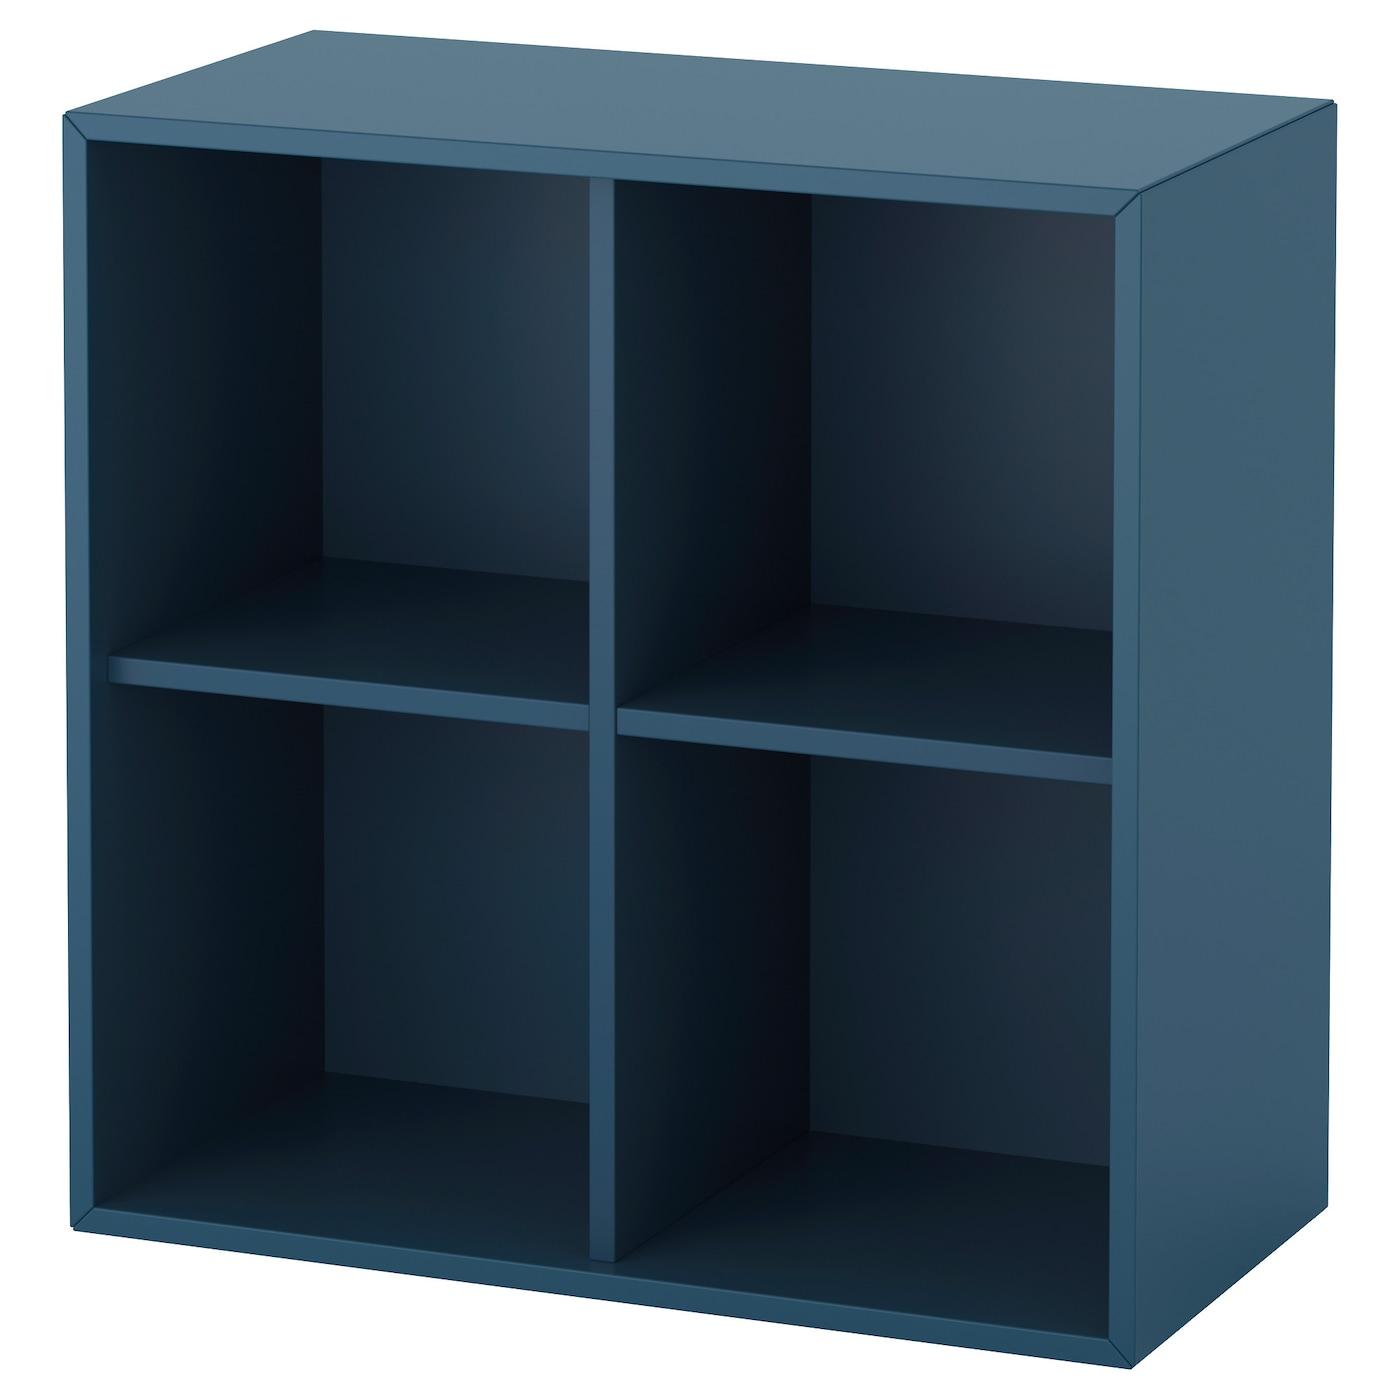 eket rangement 4 compartiments bleu fonc 70x35x70 cm ikea. Black Bedroom Furniture Sets. Home Design Ideas